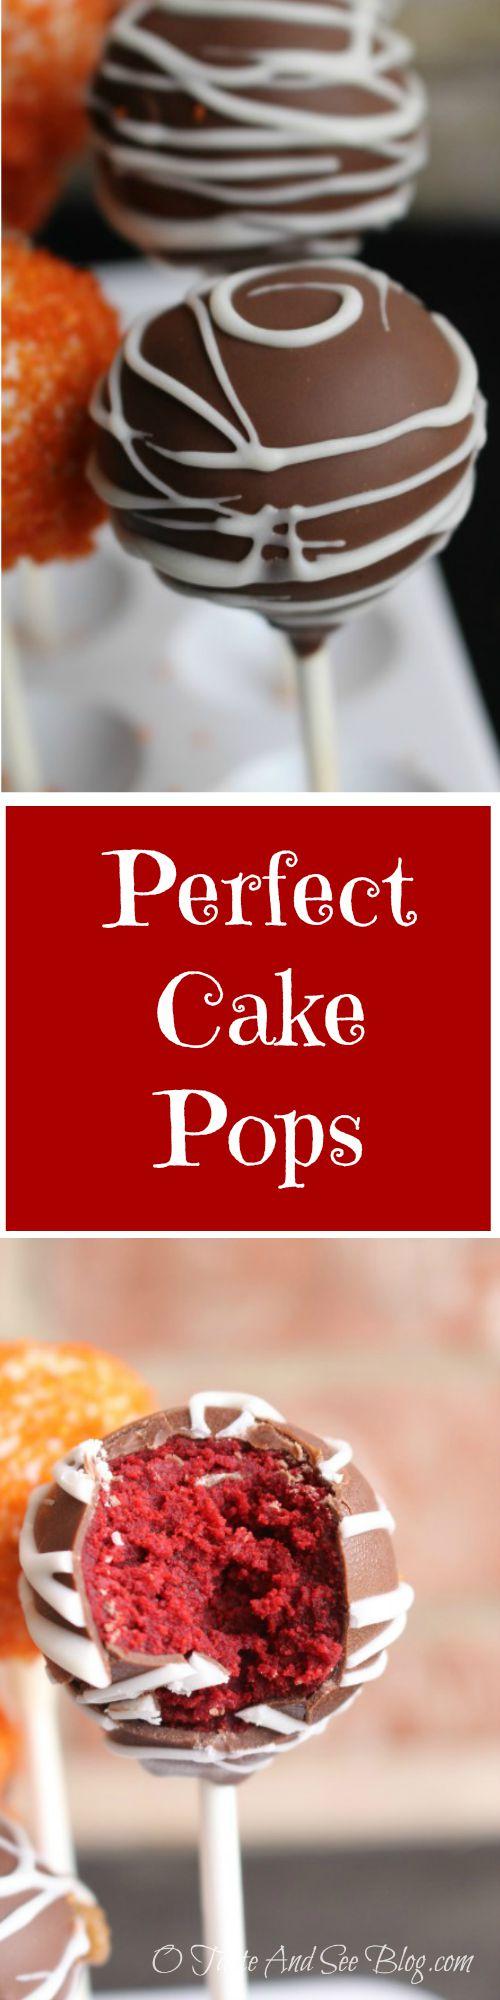 Perfect Cake Pops